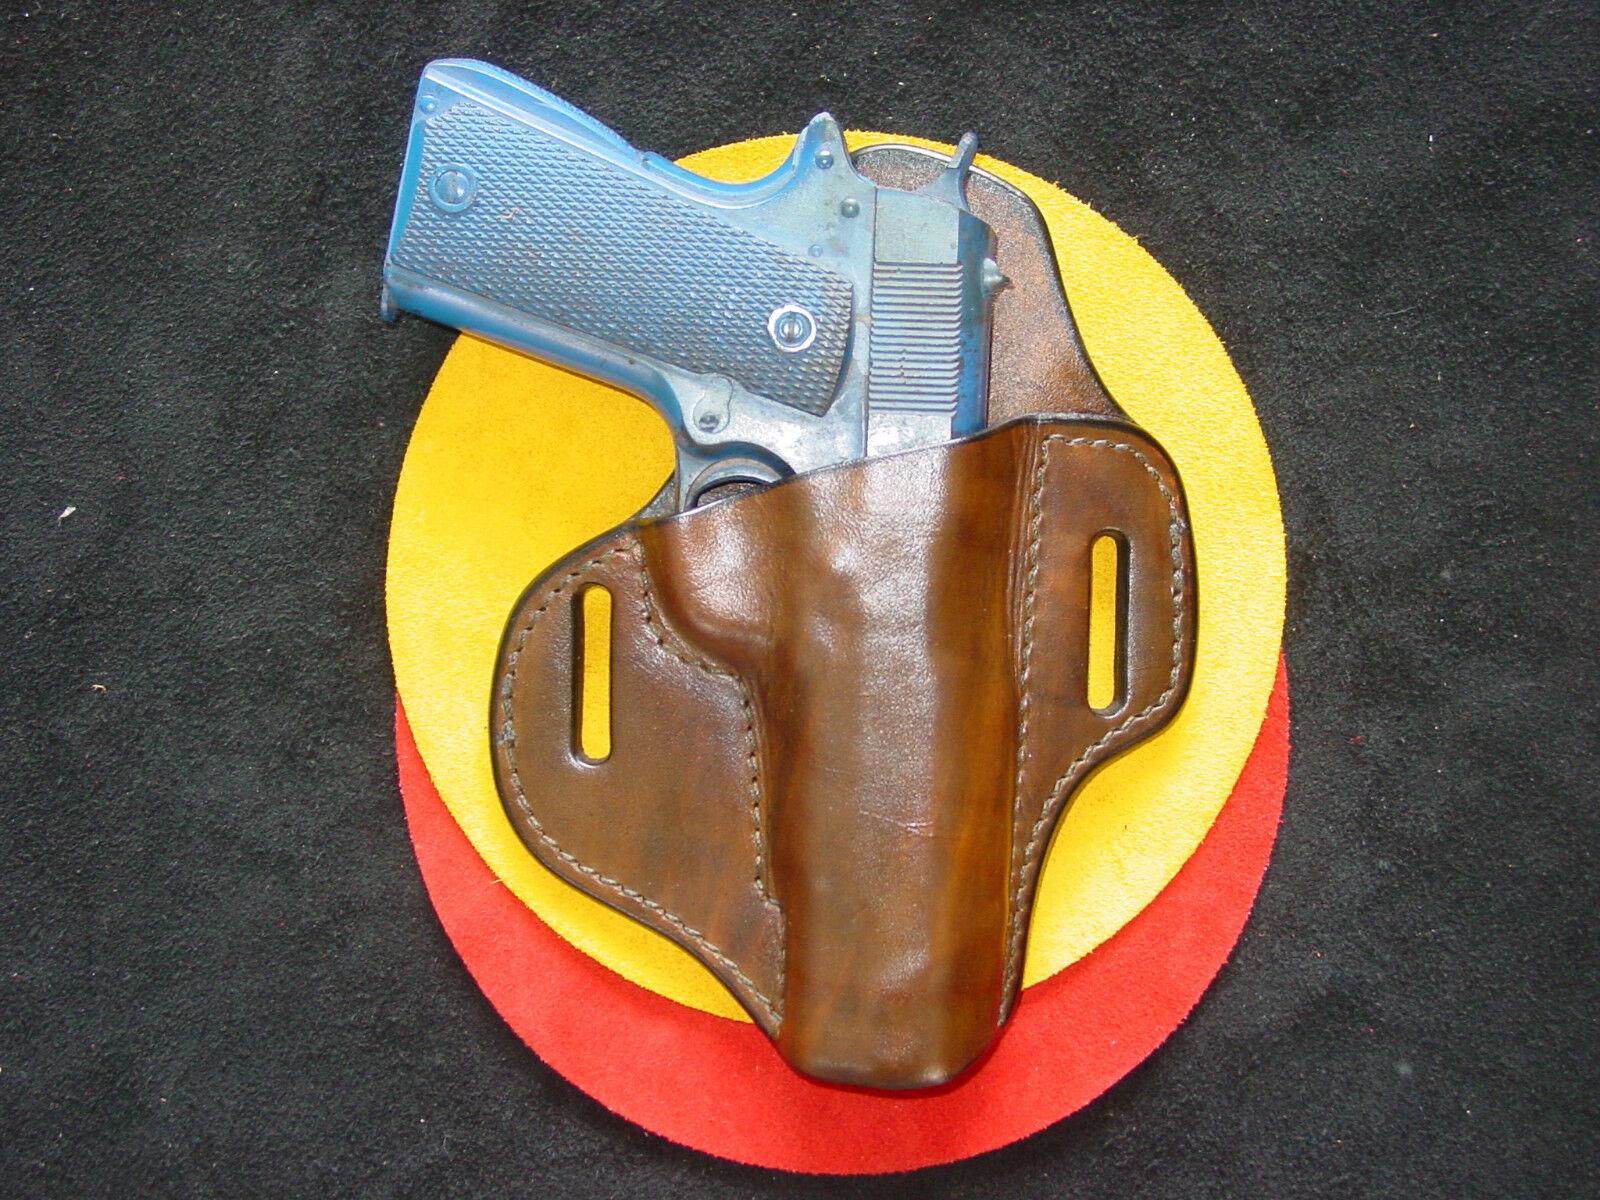 Colt  Sig  Springfield 1911 full Größe     5